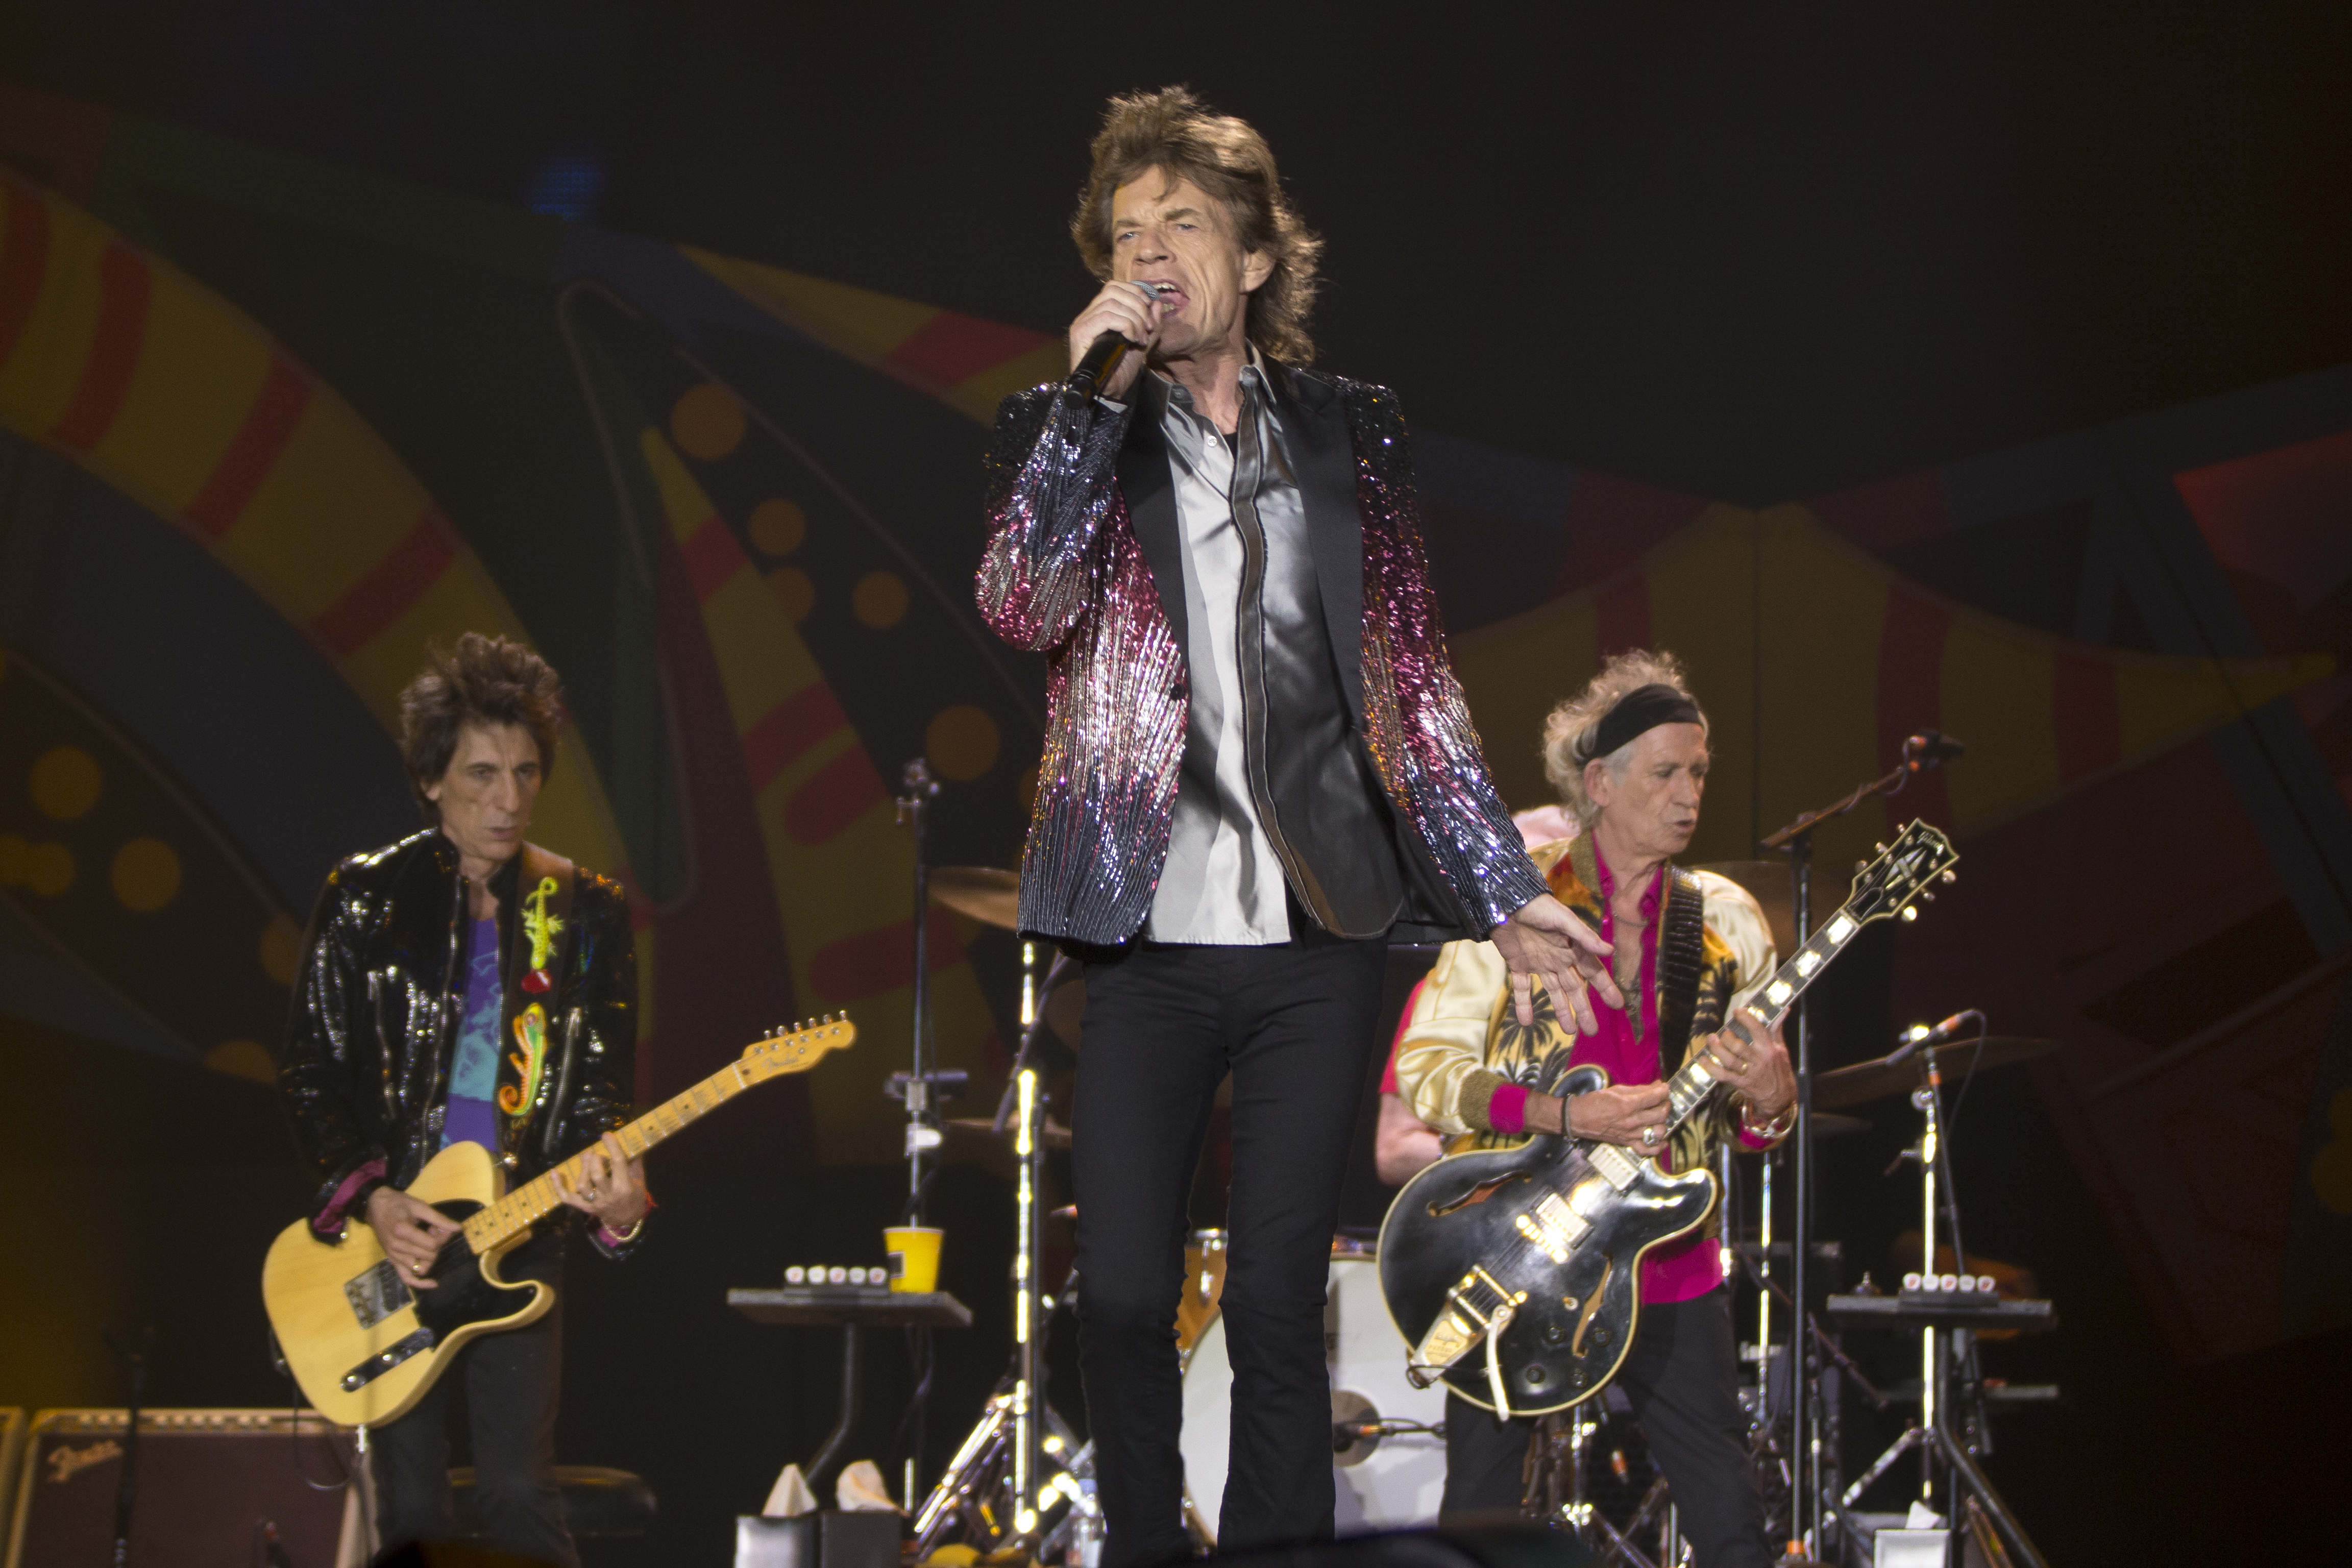 The Rolling Stones kick off their America Latina Olé Stadium Tour at Estadio Nacional in Santiago, Chile